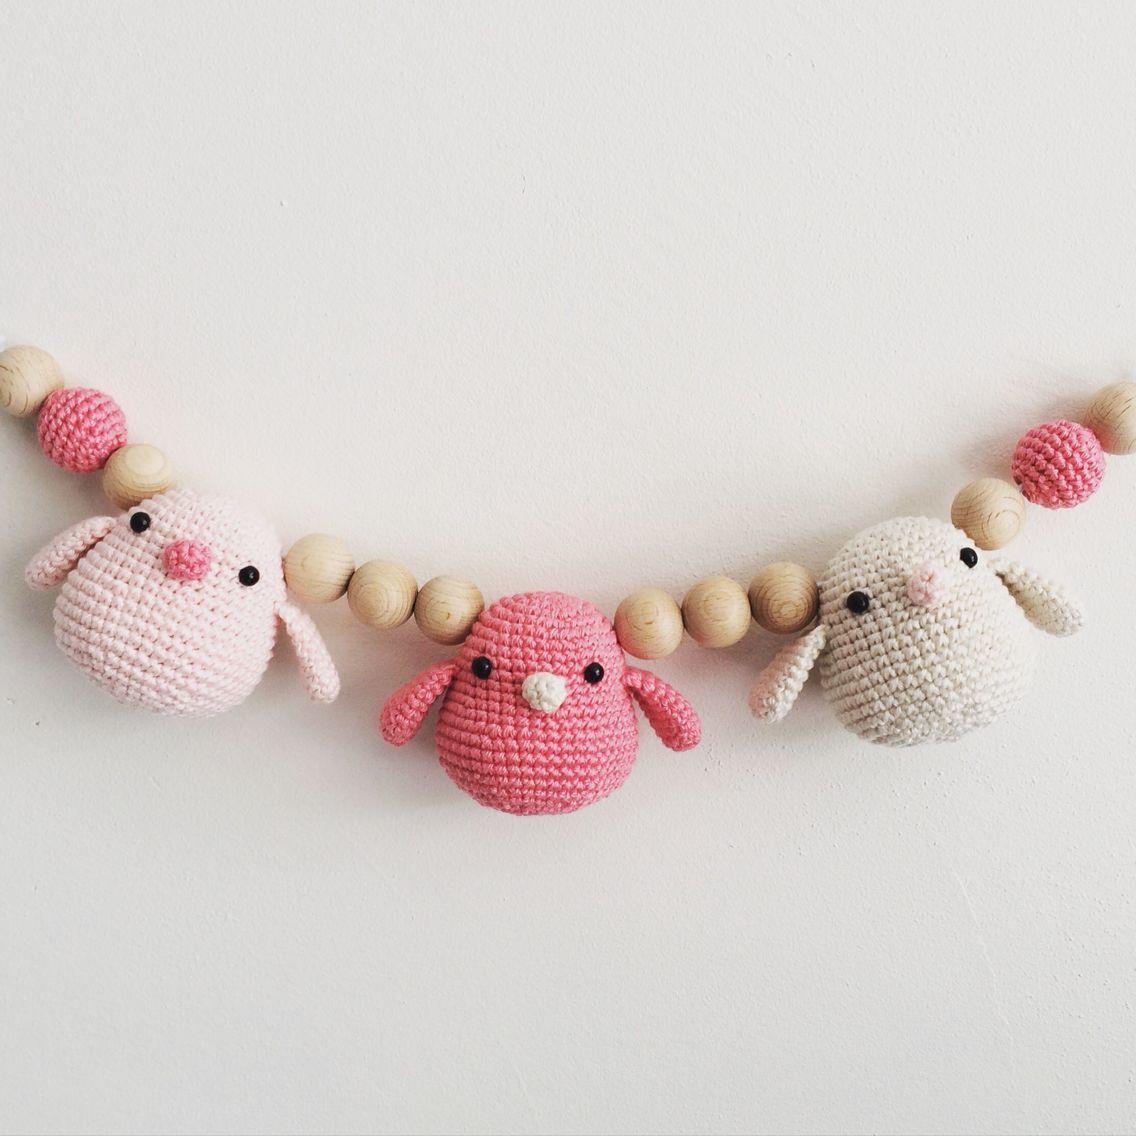 Wagenspanner Gehaakte Vogeltjes Kraamcadeau Mobile Crochet Baby